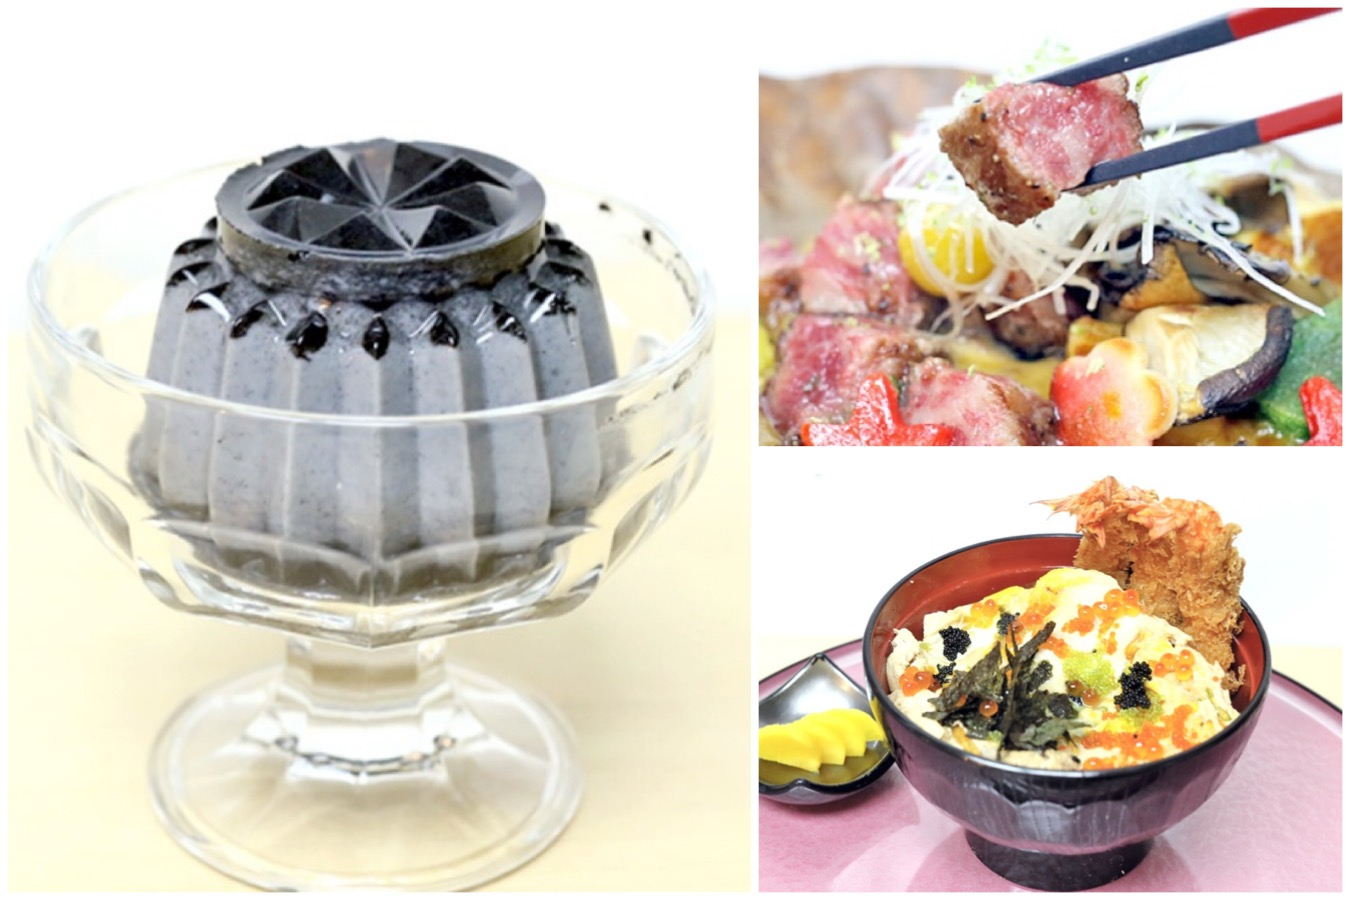 Misato - Hidden Gem In Centrepoint. Japanese Restaurant With Inexpensive Ohmi Wagyu, Ebi Donburi And Goma Pudding